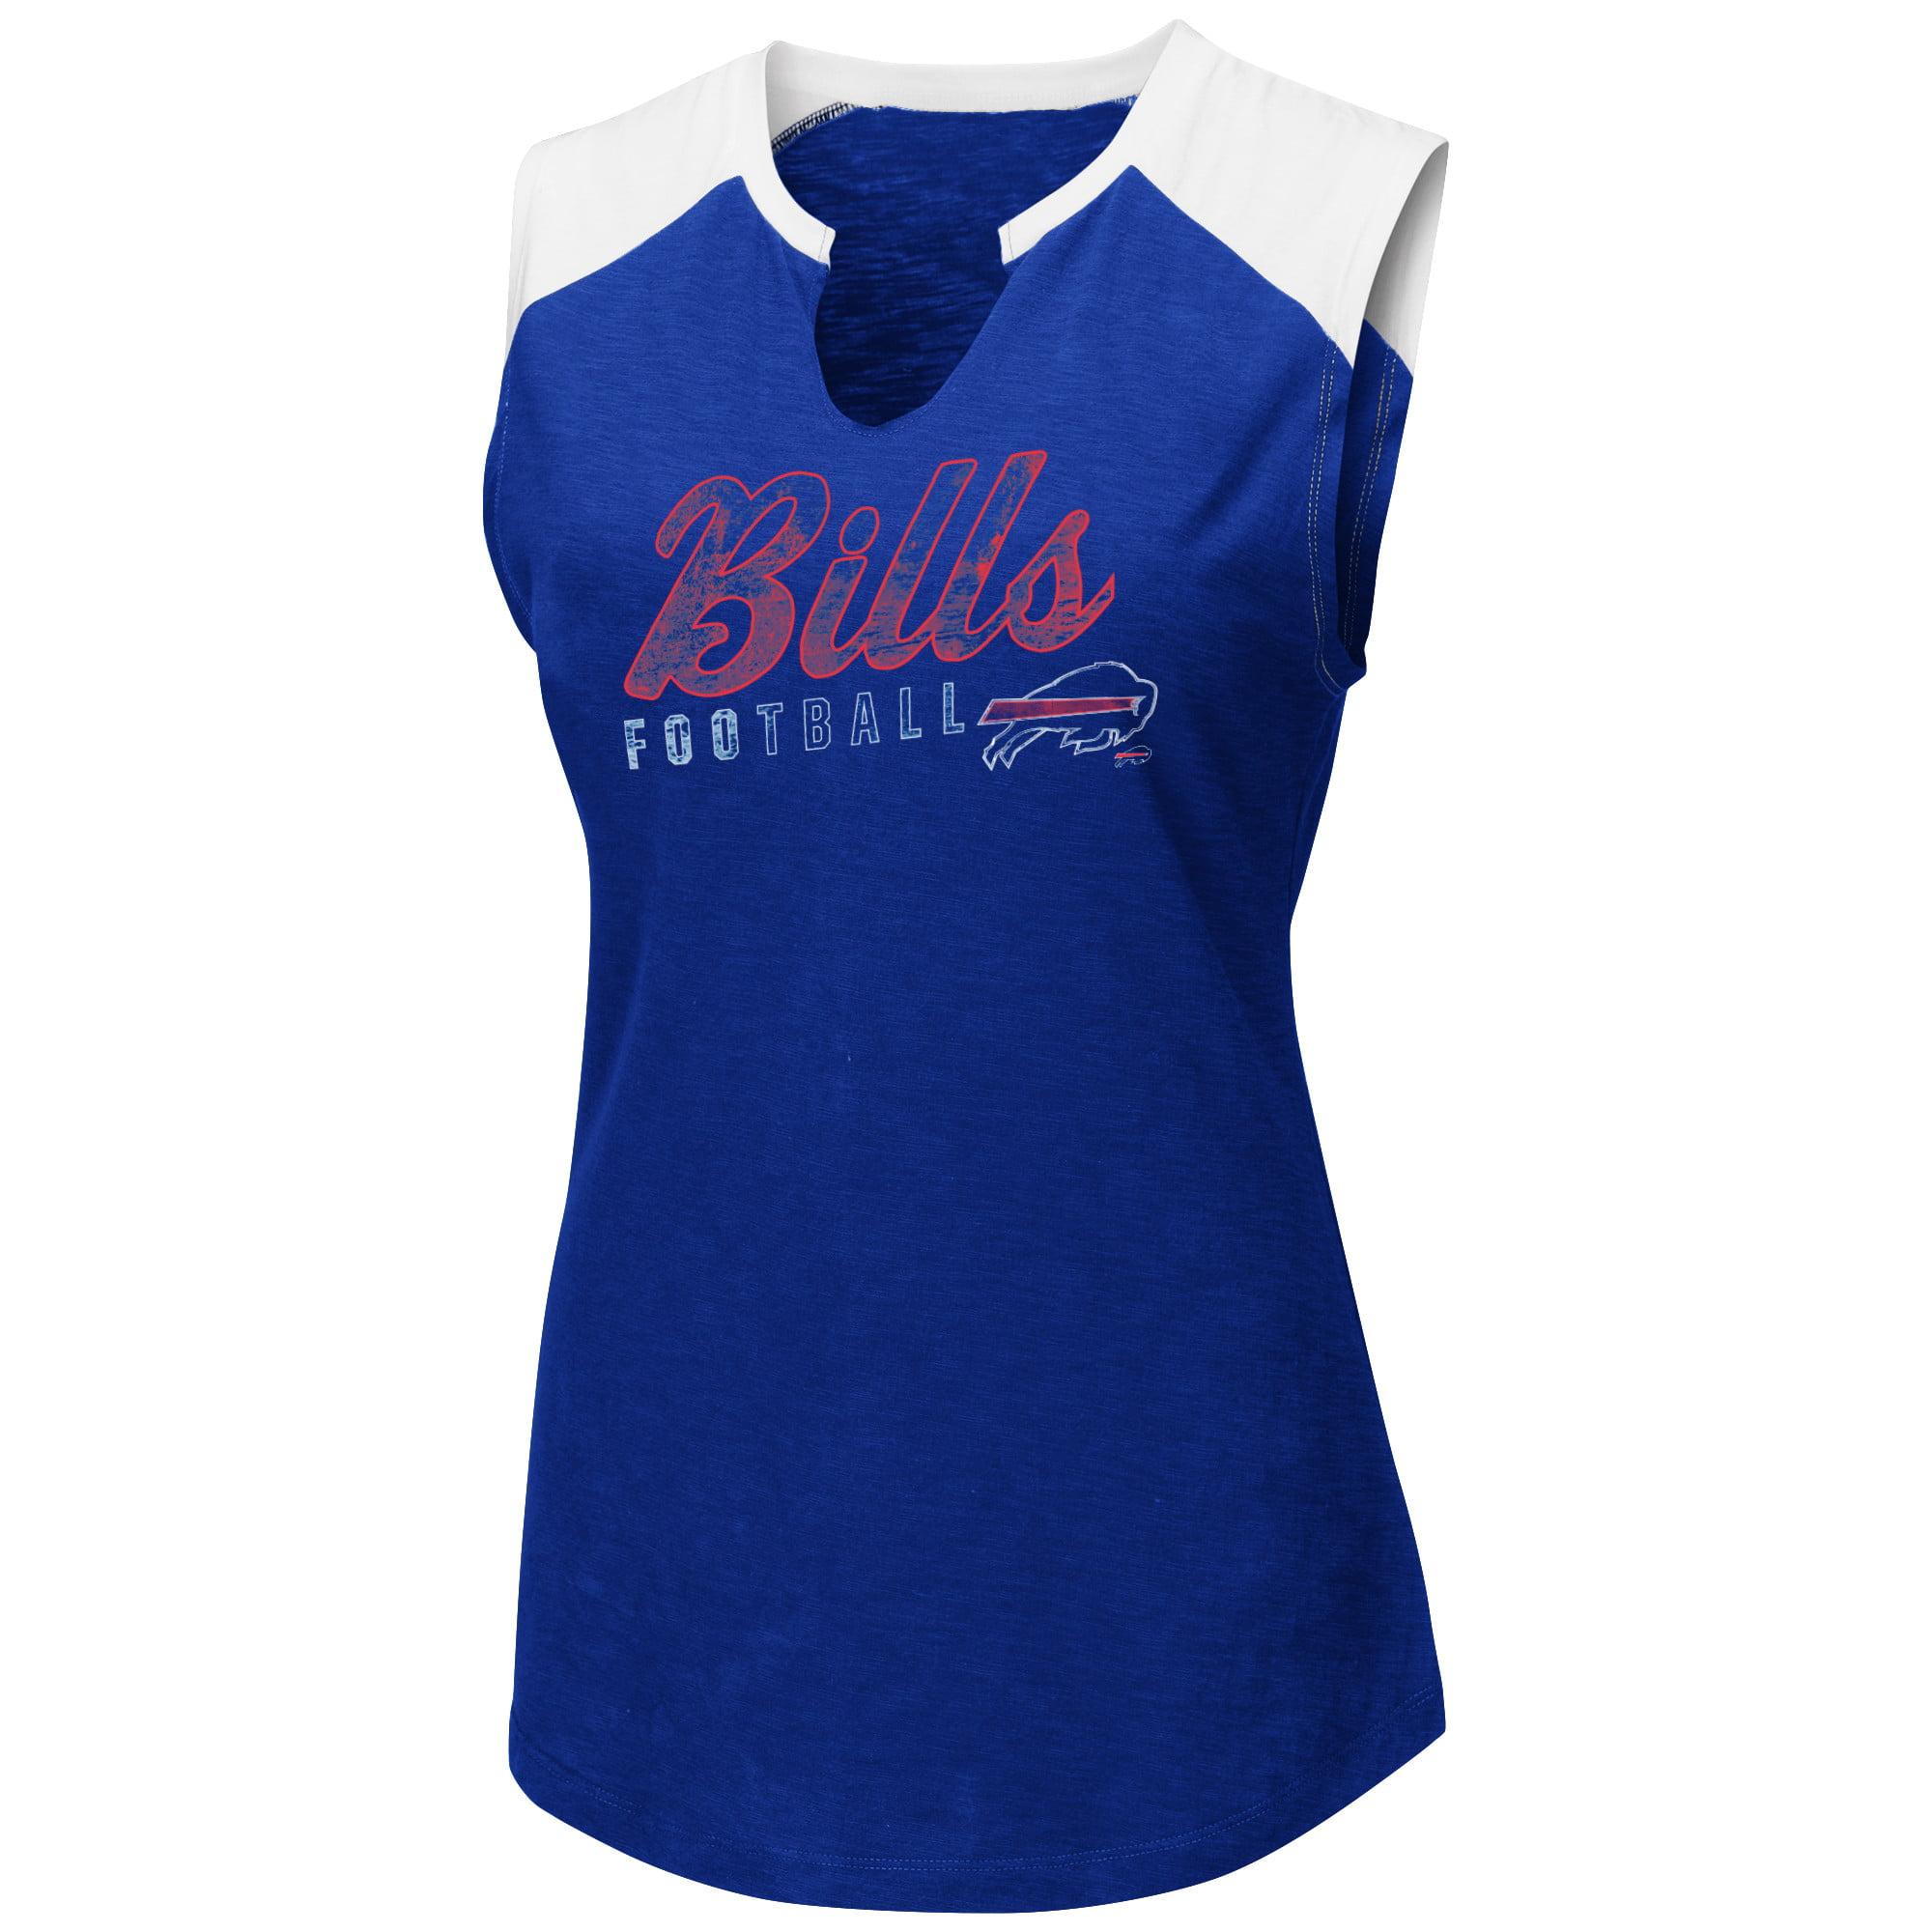 Women's Majestic Royal/White Buffalo Bills V-Notch Muscle Tank Top